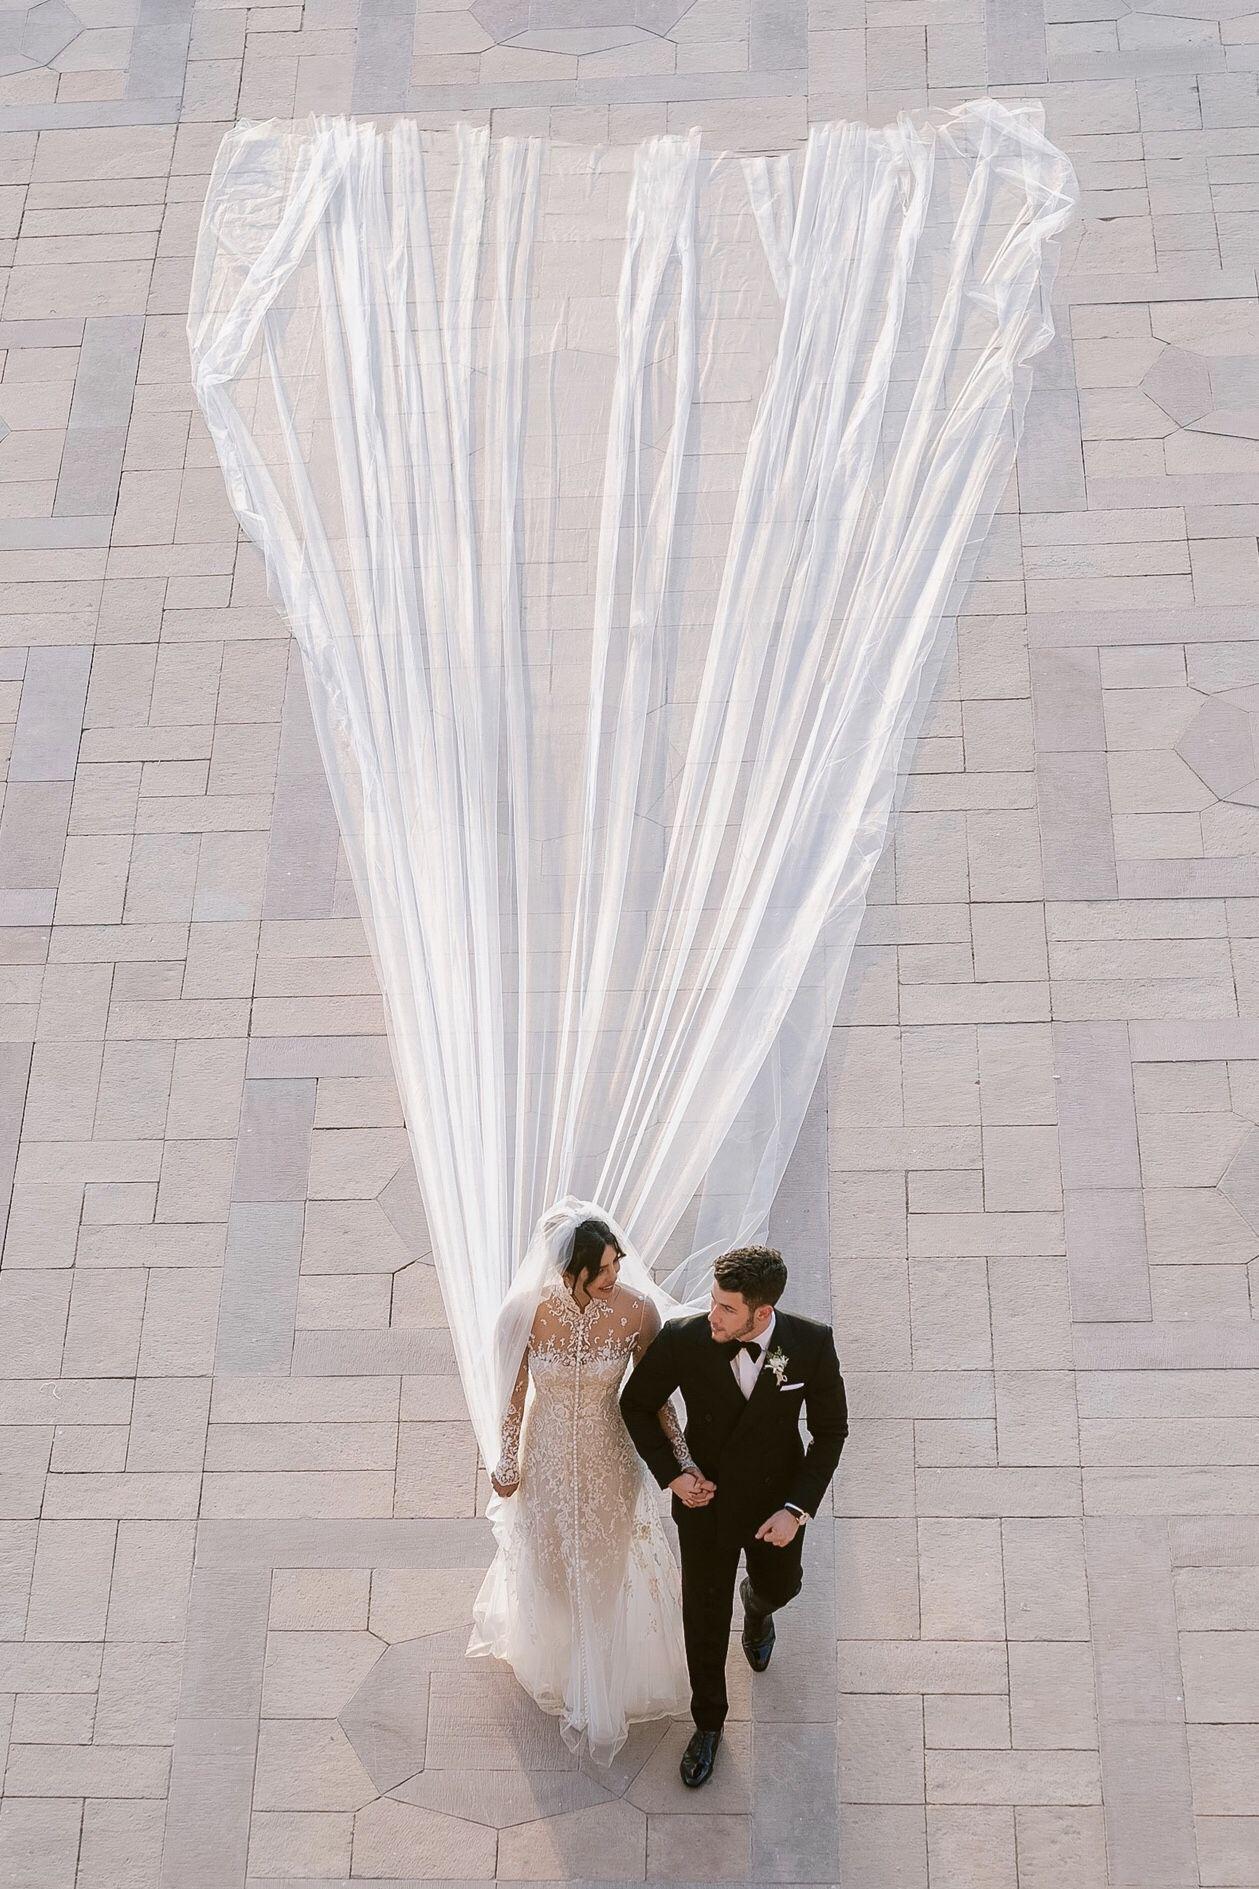 That Priyanka Chopra And Nick Jonas Whose Nuptials Aimed To Fuse Family Traditions Eastern Priyanka Chopra Wedding Romantic Wedding Photos Celebrity Weddings